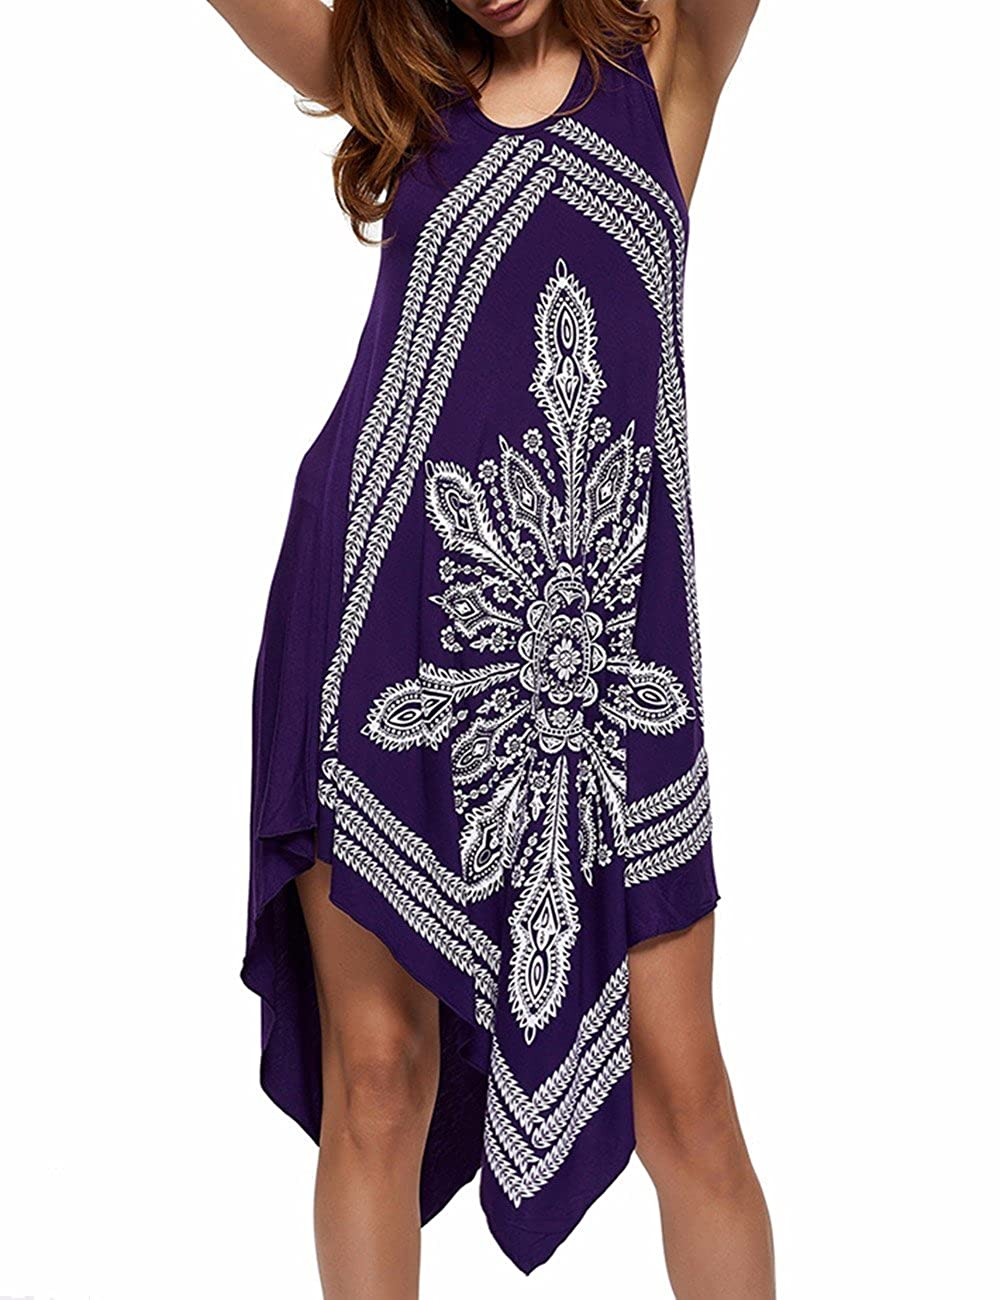 IMAGINE Women's Strapless Floral Print Bohemian Casual Mini Beach Dress